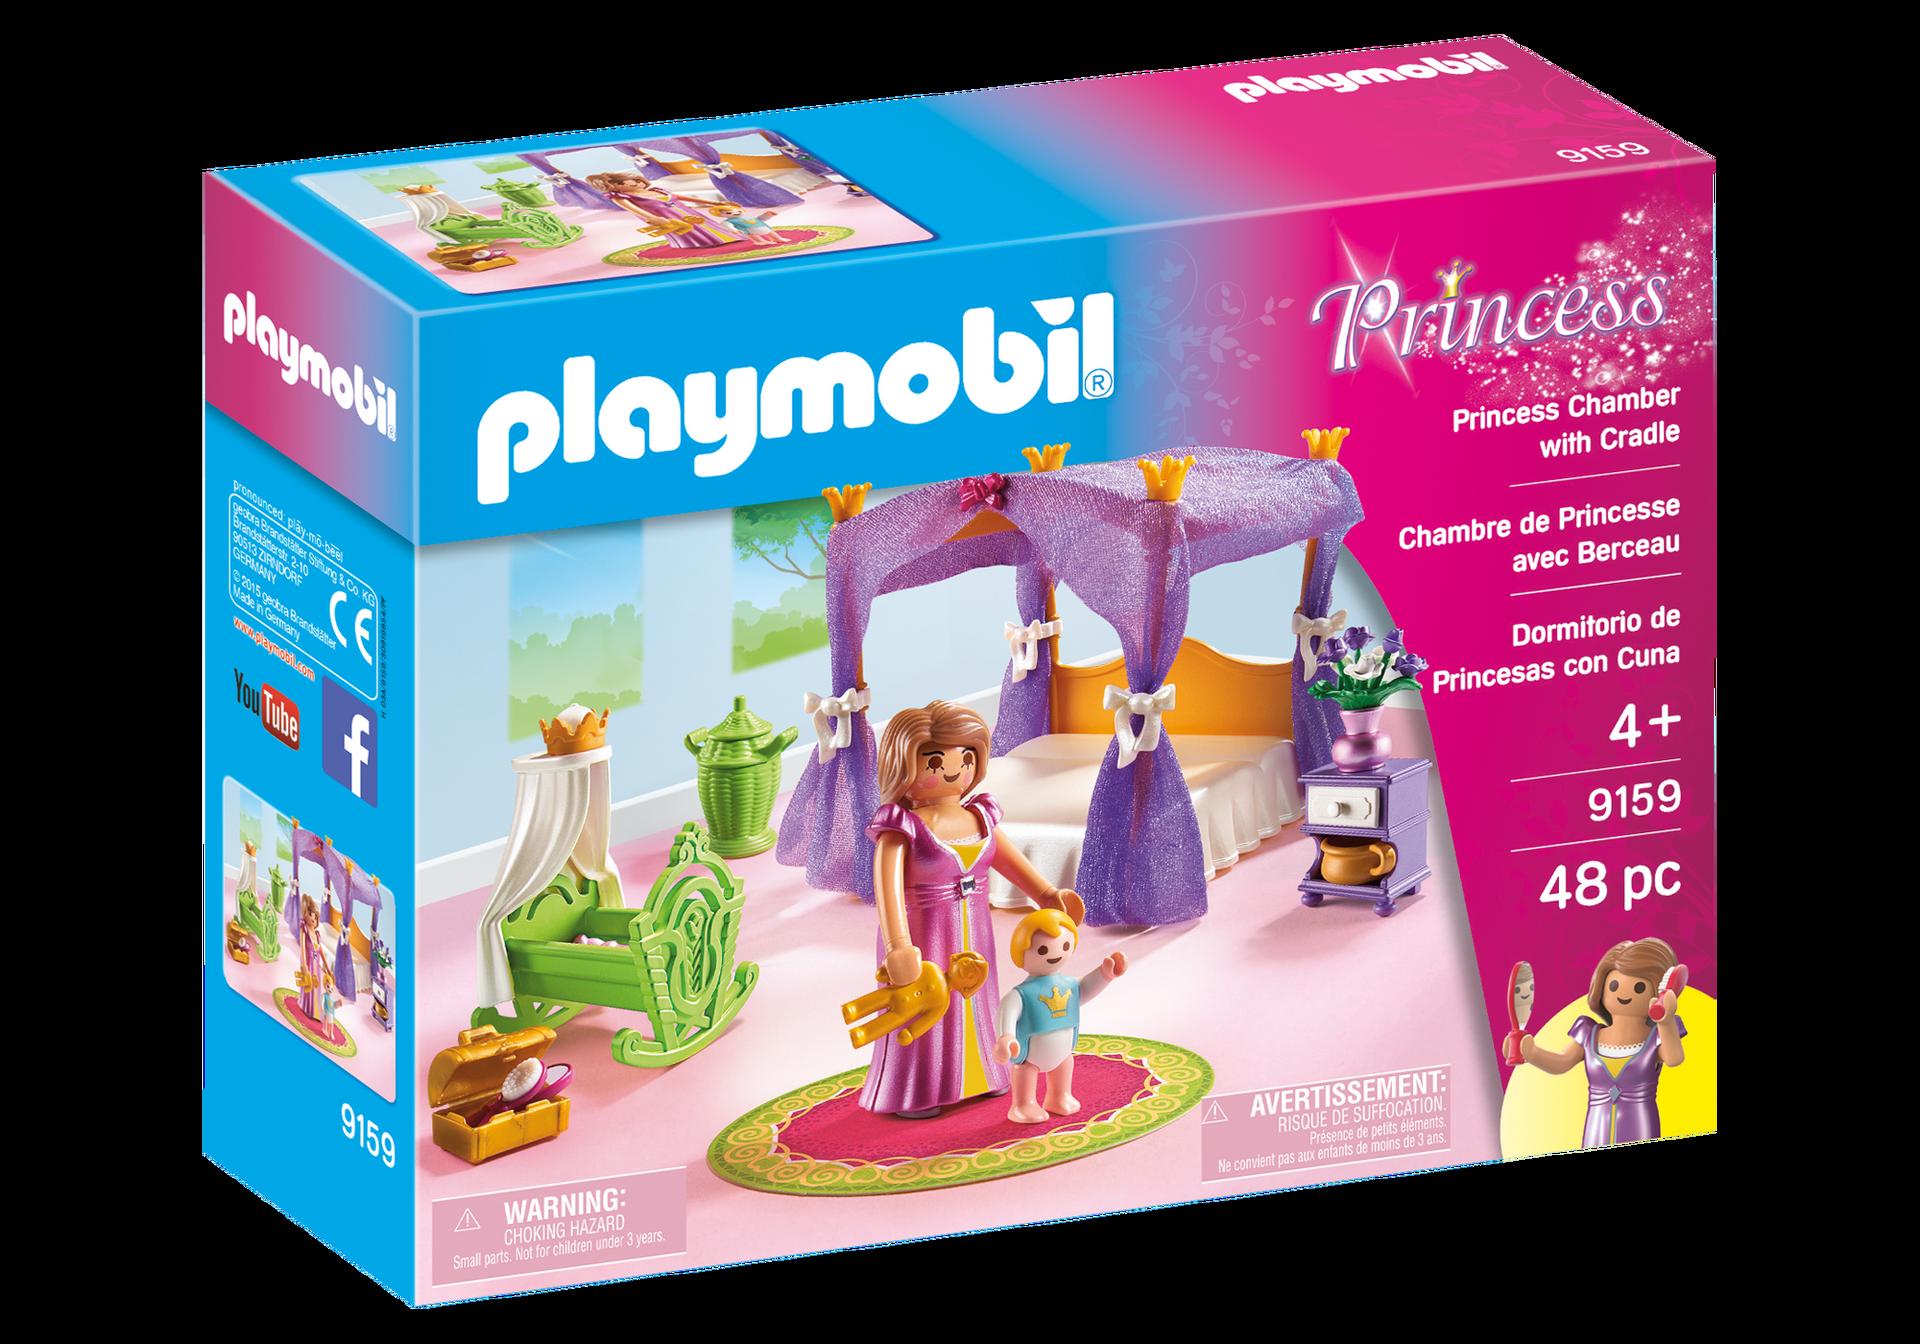 awesome chambre princesse playmobil photos yourmentor info - Playmobil Chambres Princesses